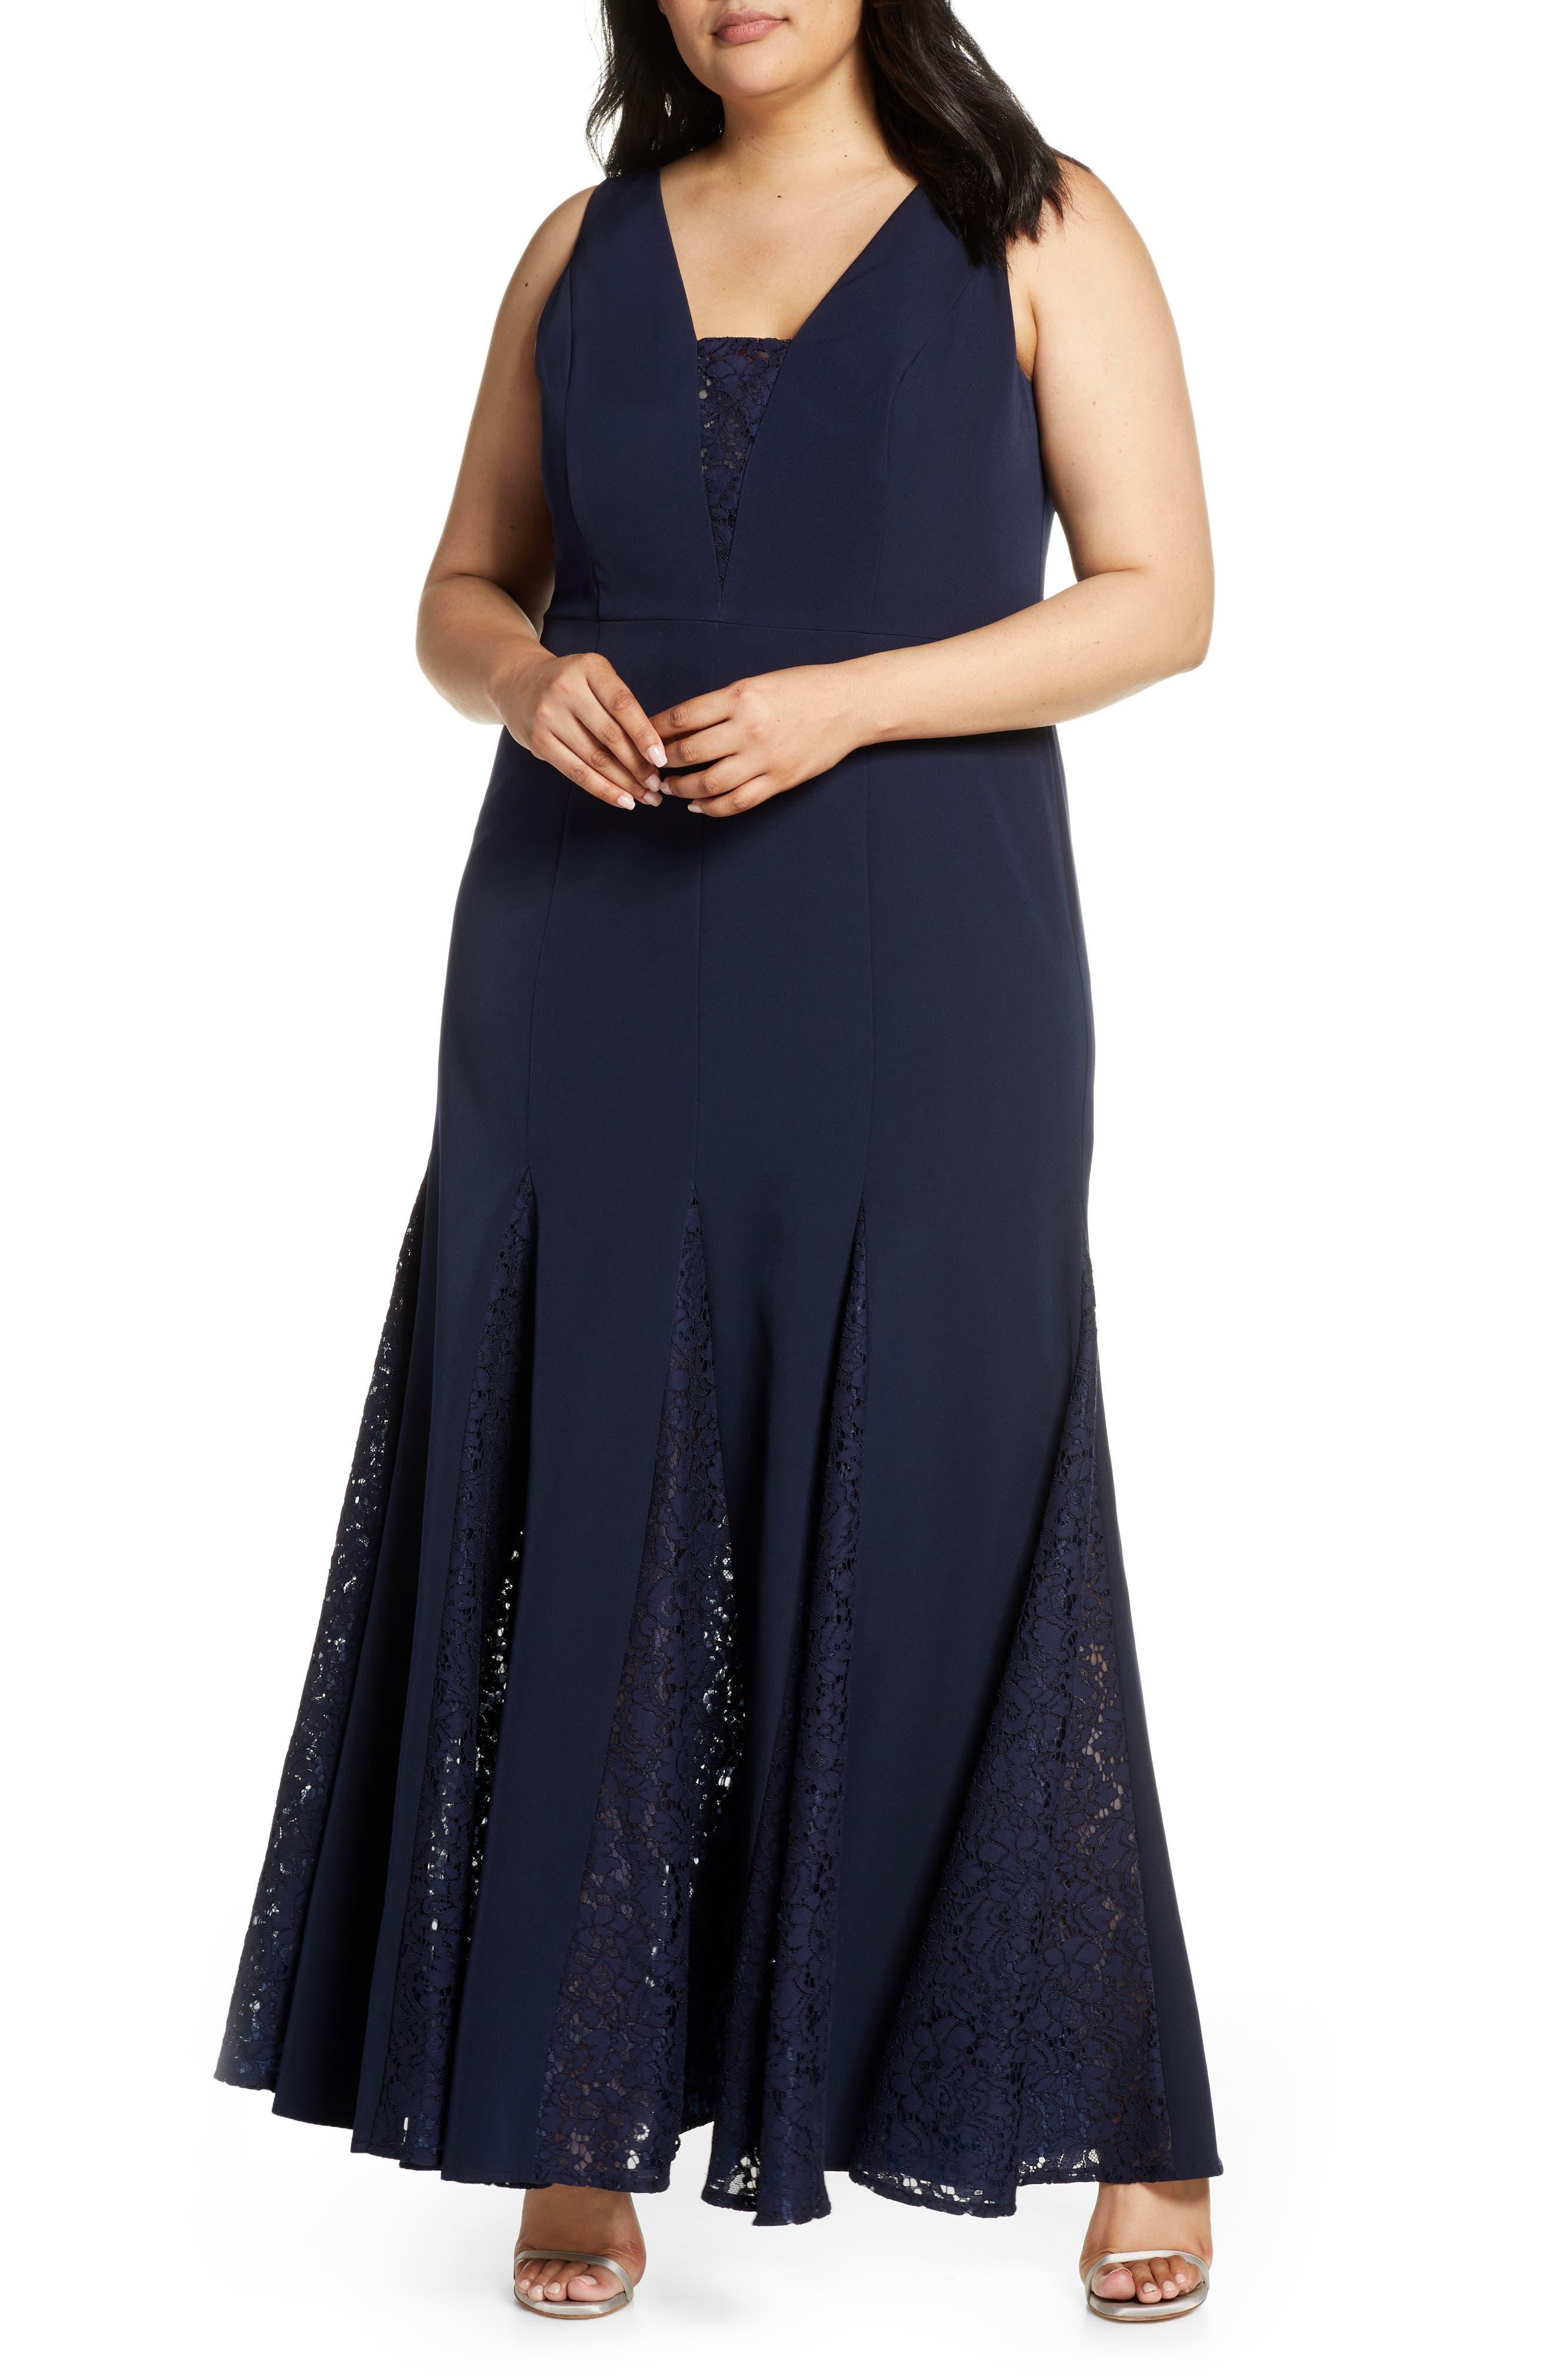 1930s Evening Dresses | Old Hollywood Dress Plus Size Womens Eliza J Lace Inset Laguna Crepe Trumpet Gown $228.00 AT vintagedancer.com